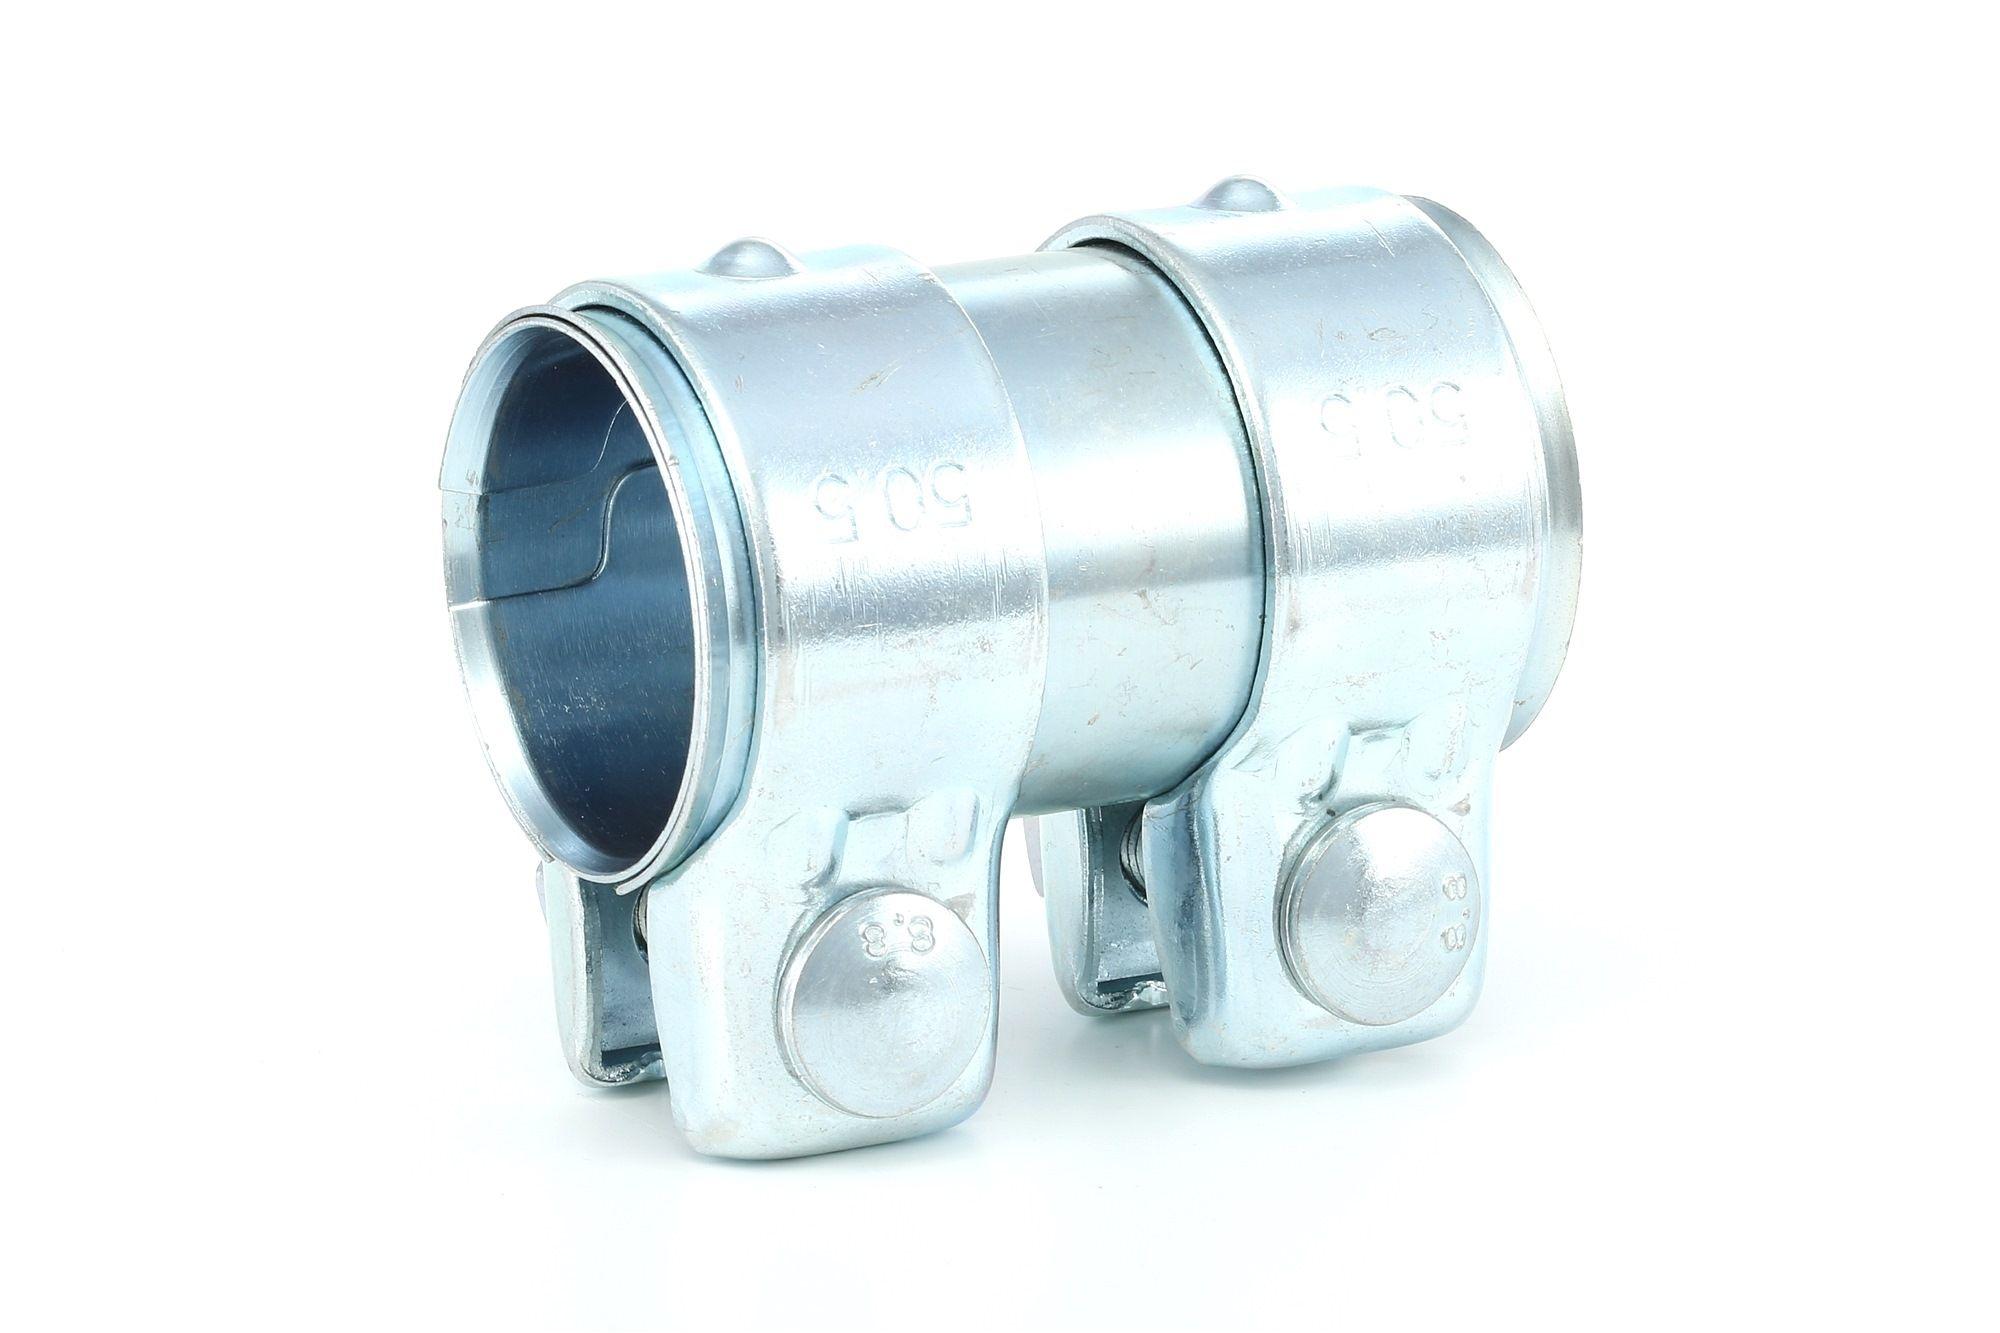 Rohrverbinder, Abgasanlage FA1 114-946 Bewertung